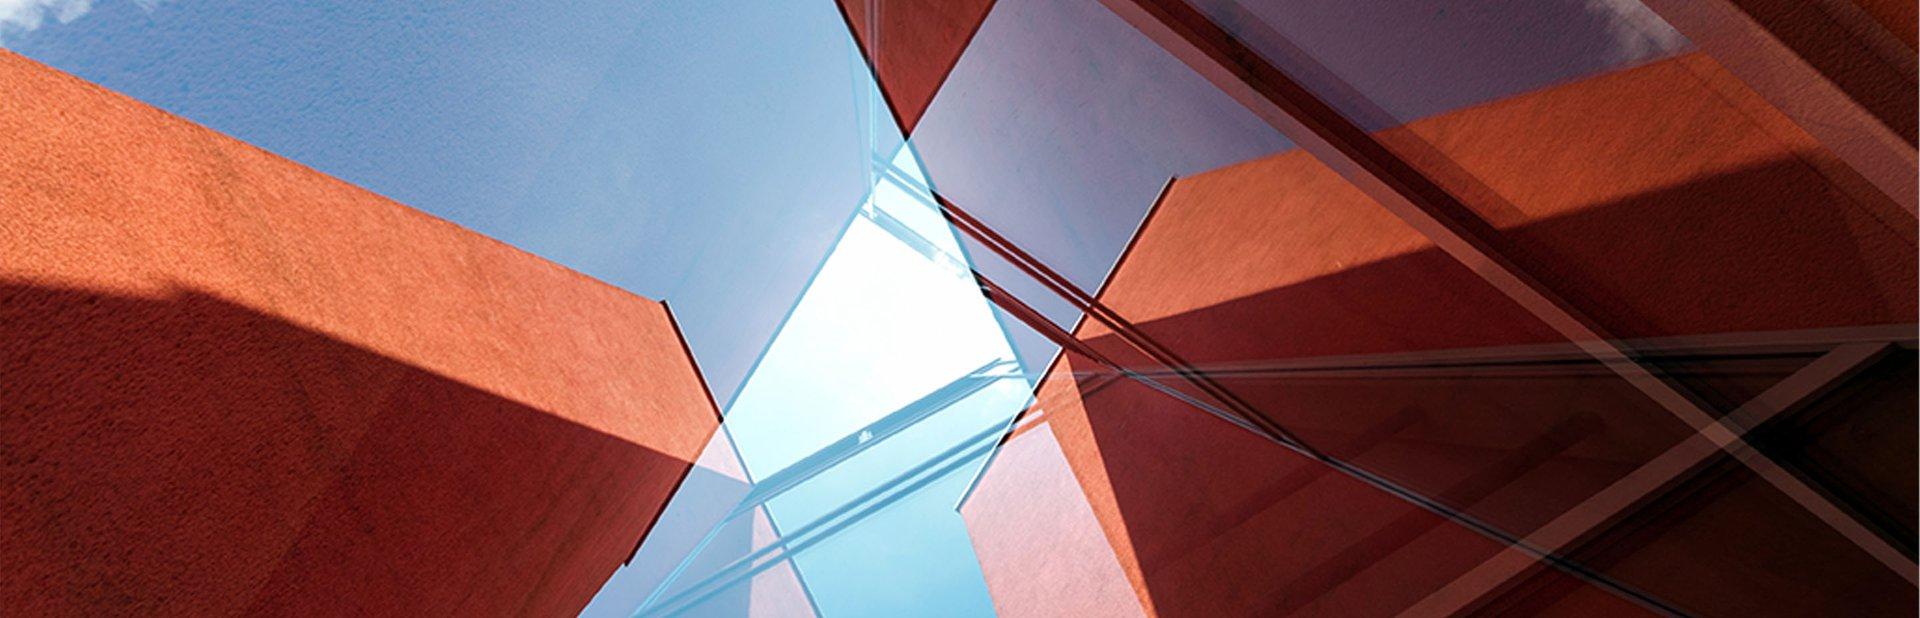 Máster en Arquitectura en Madrid